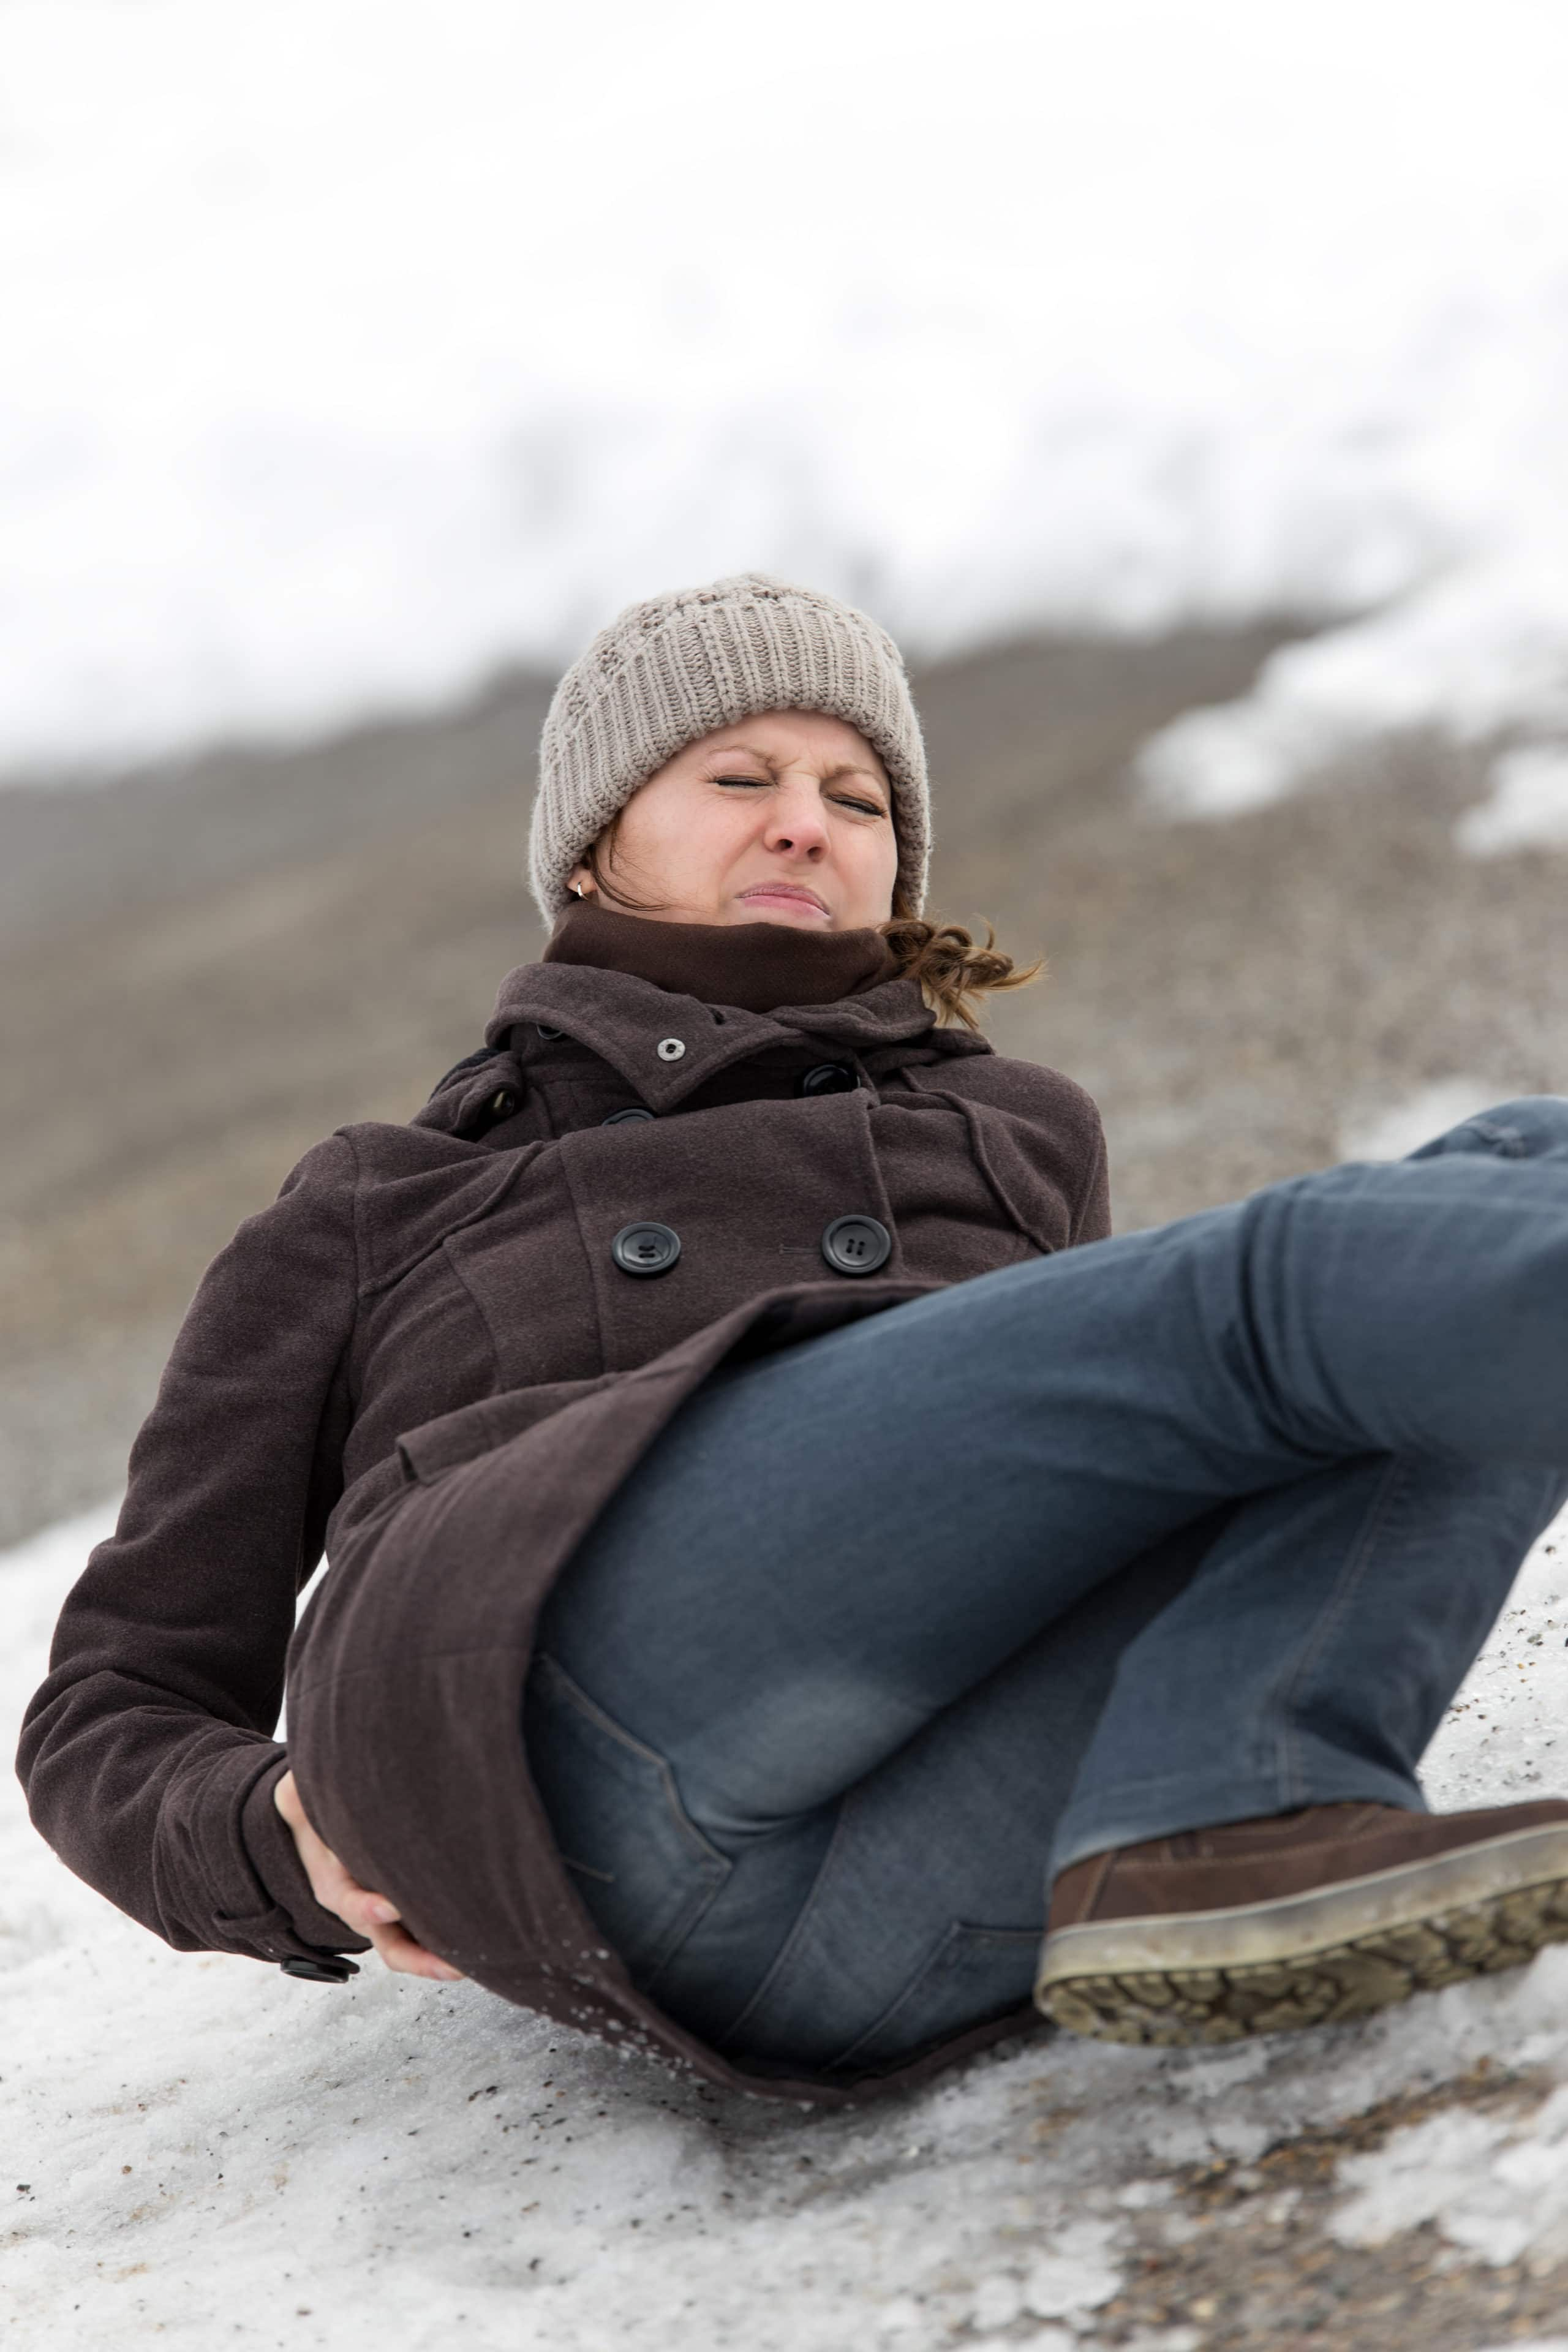 fall onto sitting bone maybe aggravating hamstring tendinopathy or ischial bursitis